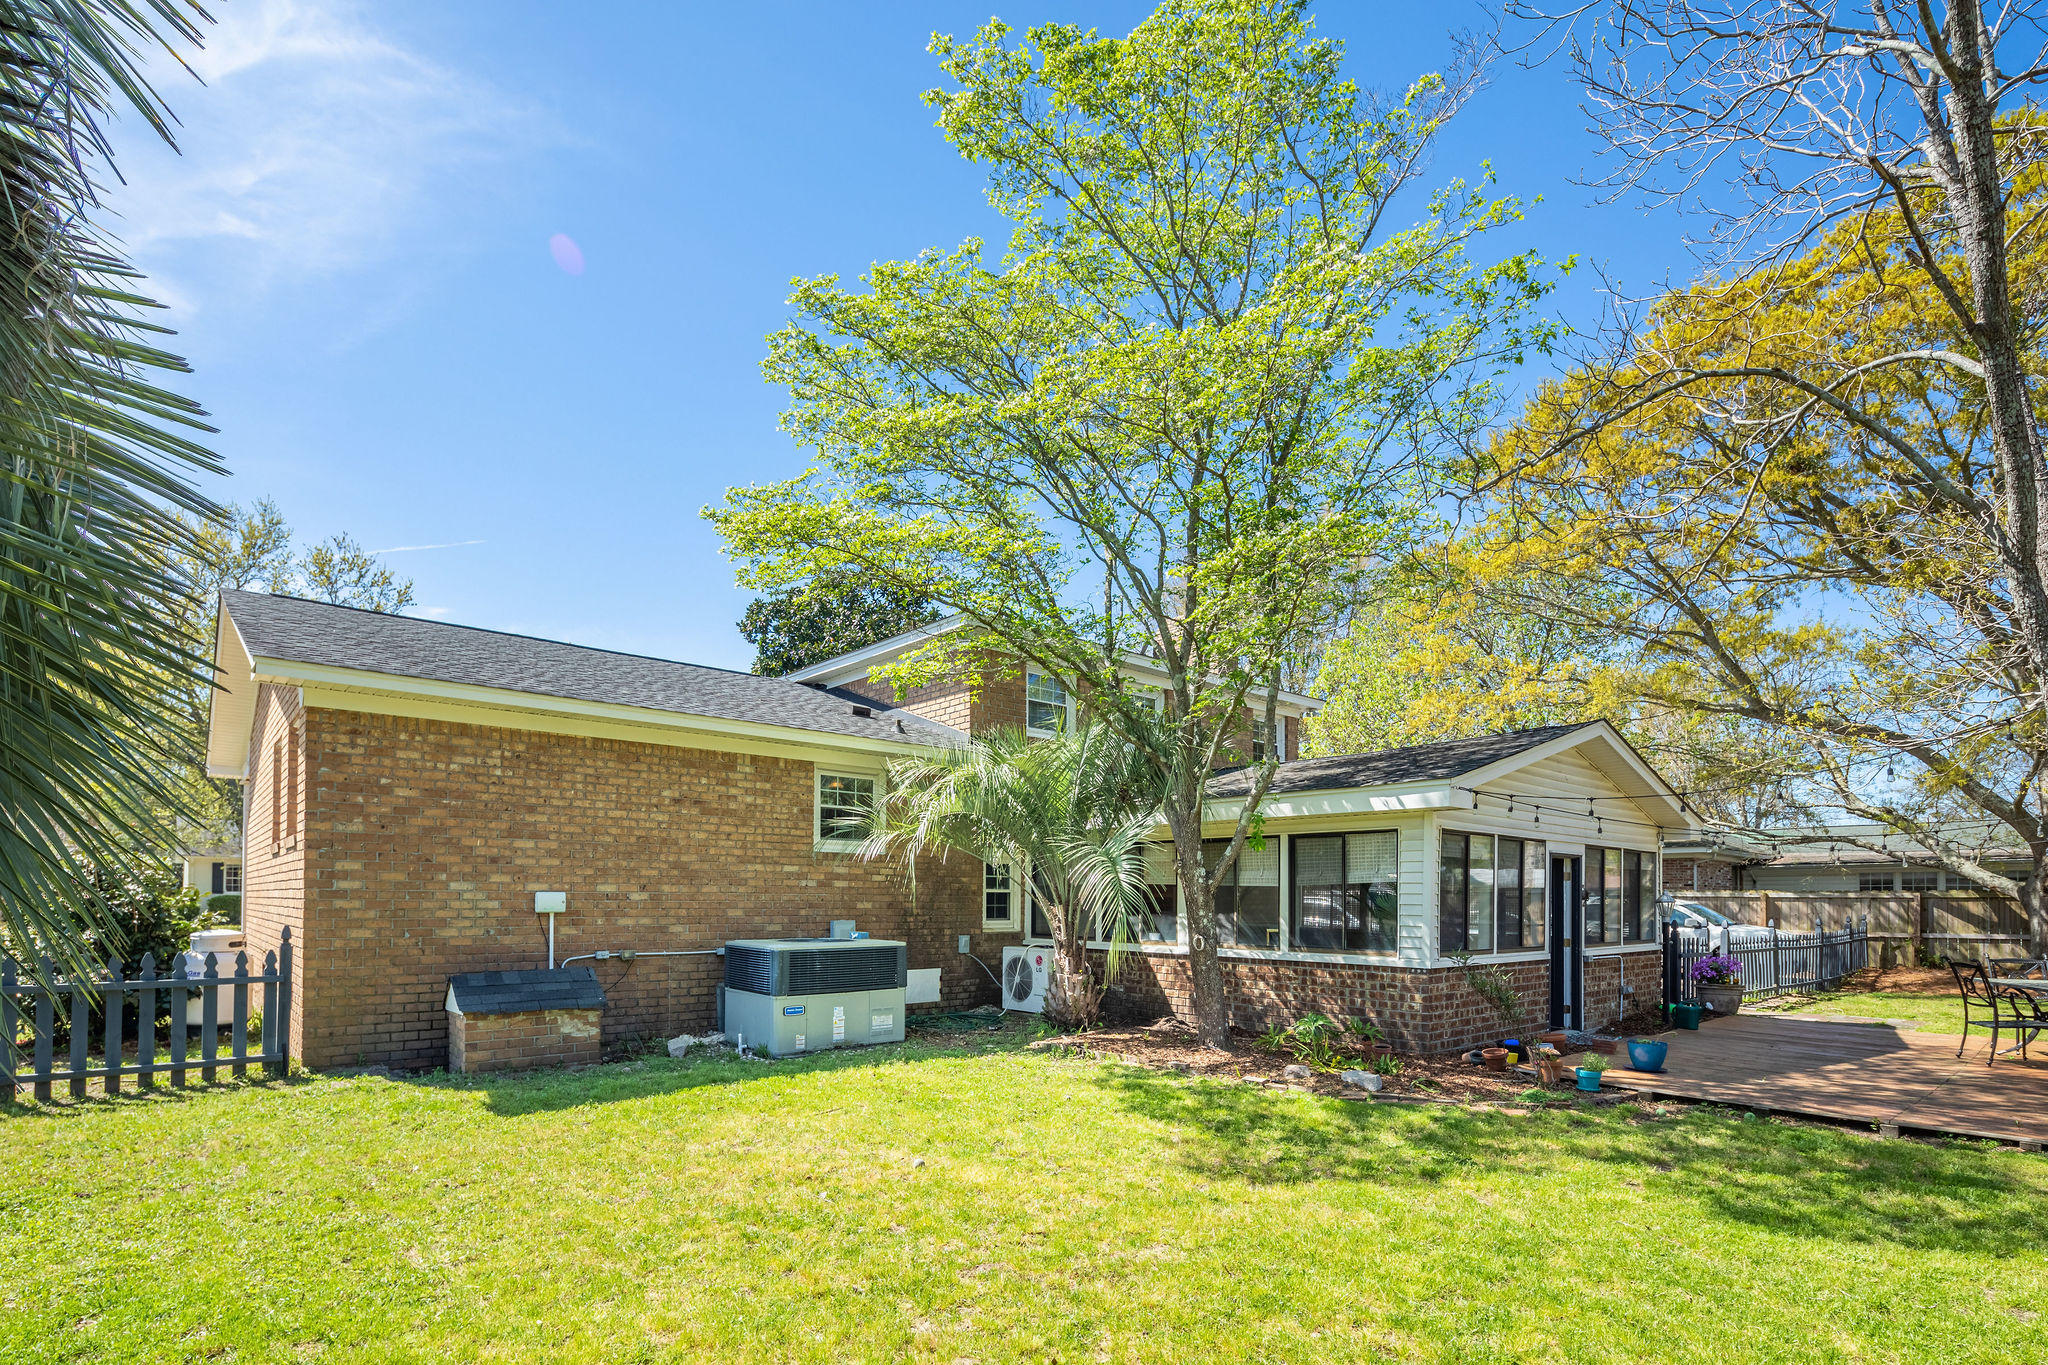 Cooper Estates Homes For Sale - 1058 Cottingham, Mount Pleasant, SC - 18